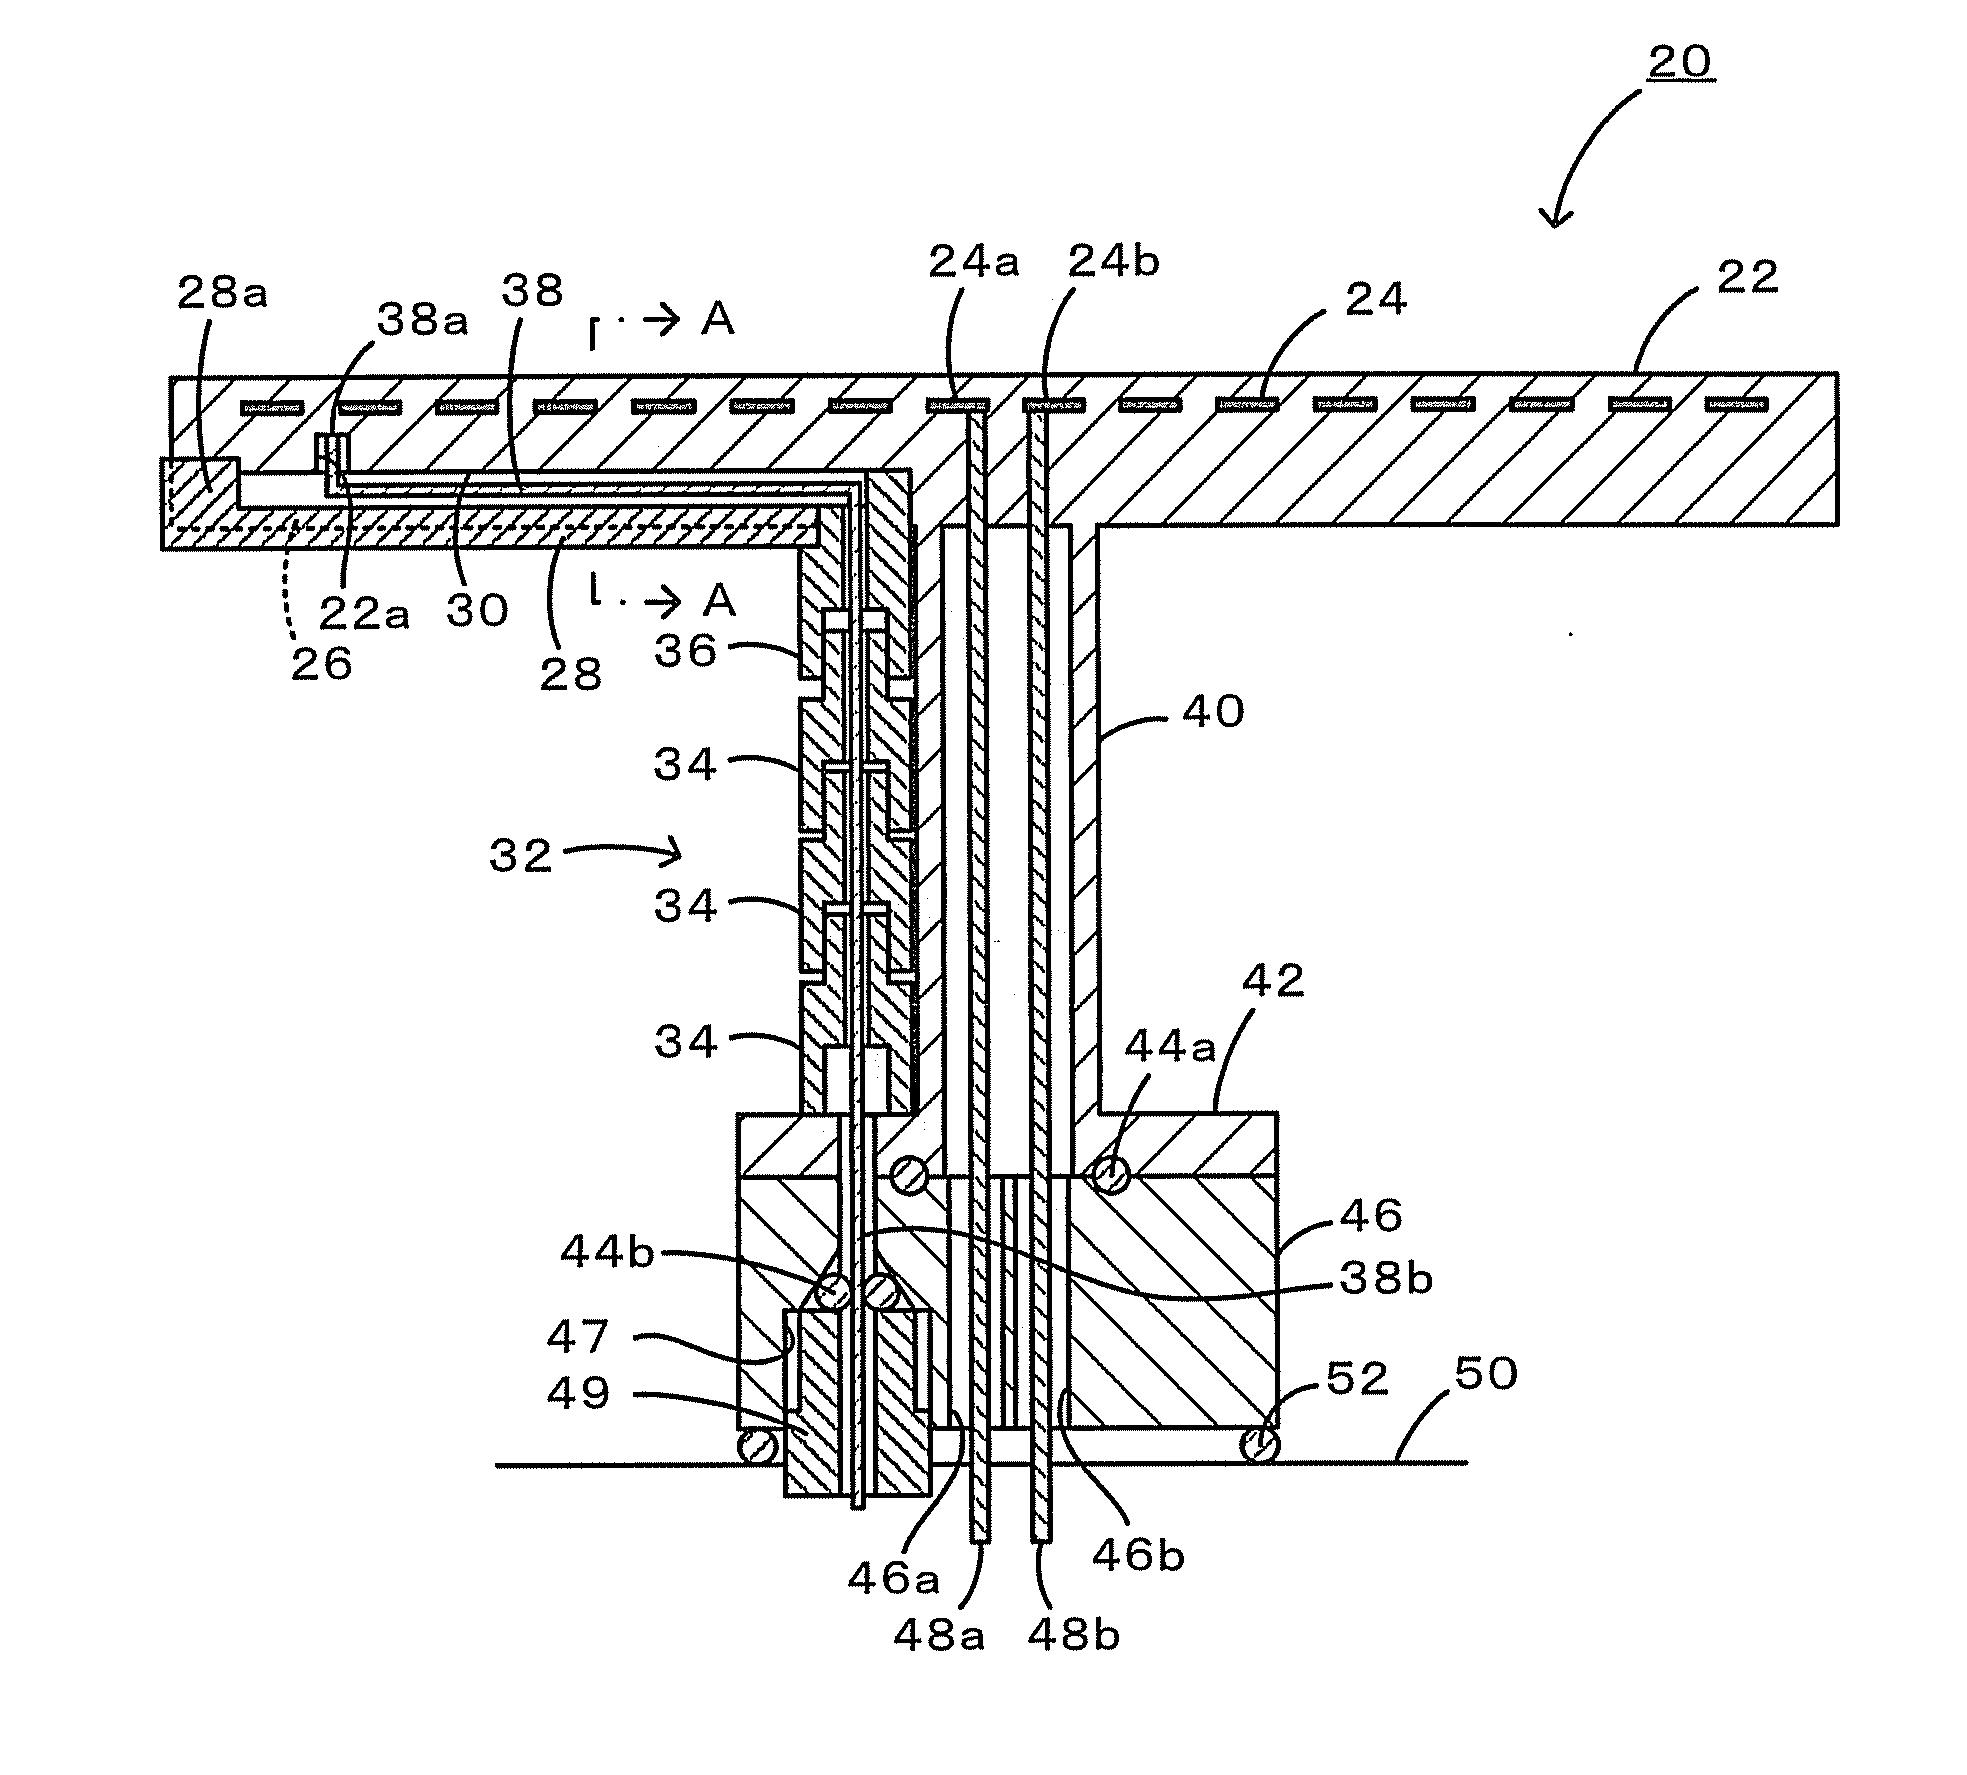 king baseboard thermostat wiring diagram baseboard water